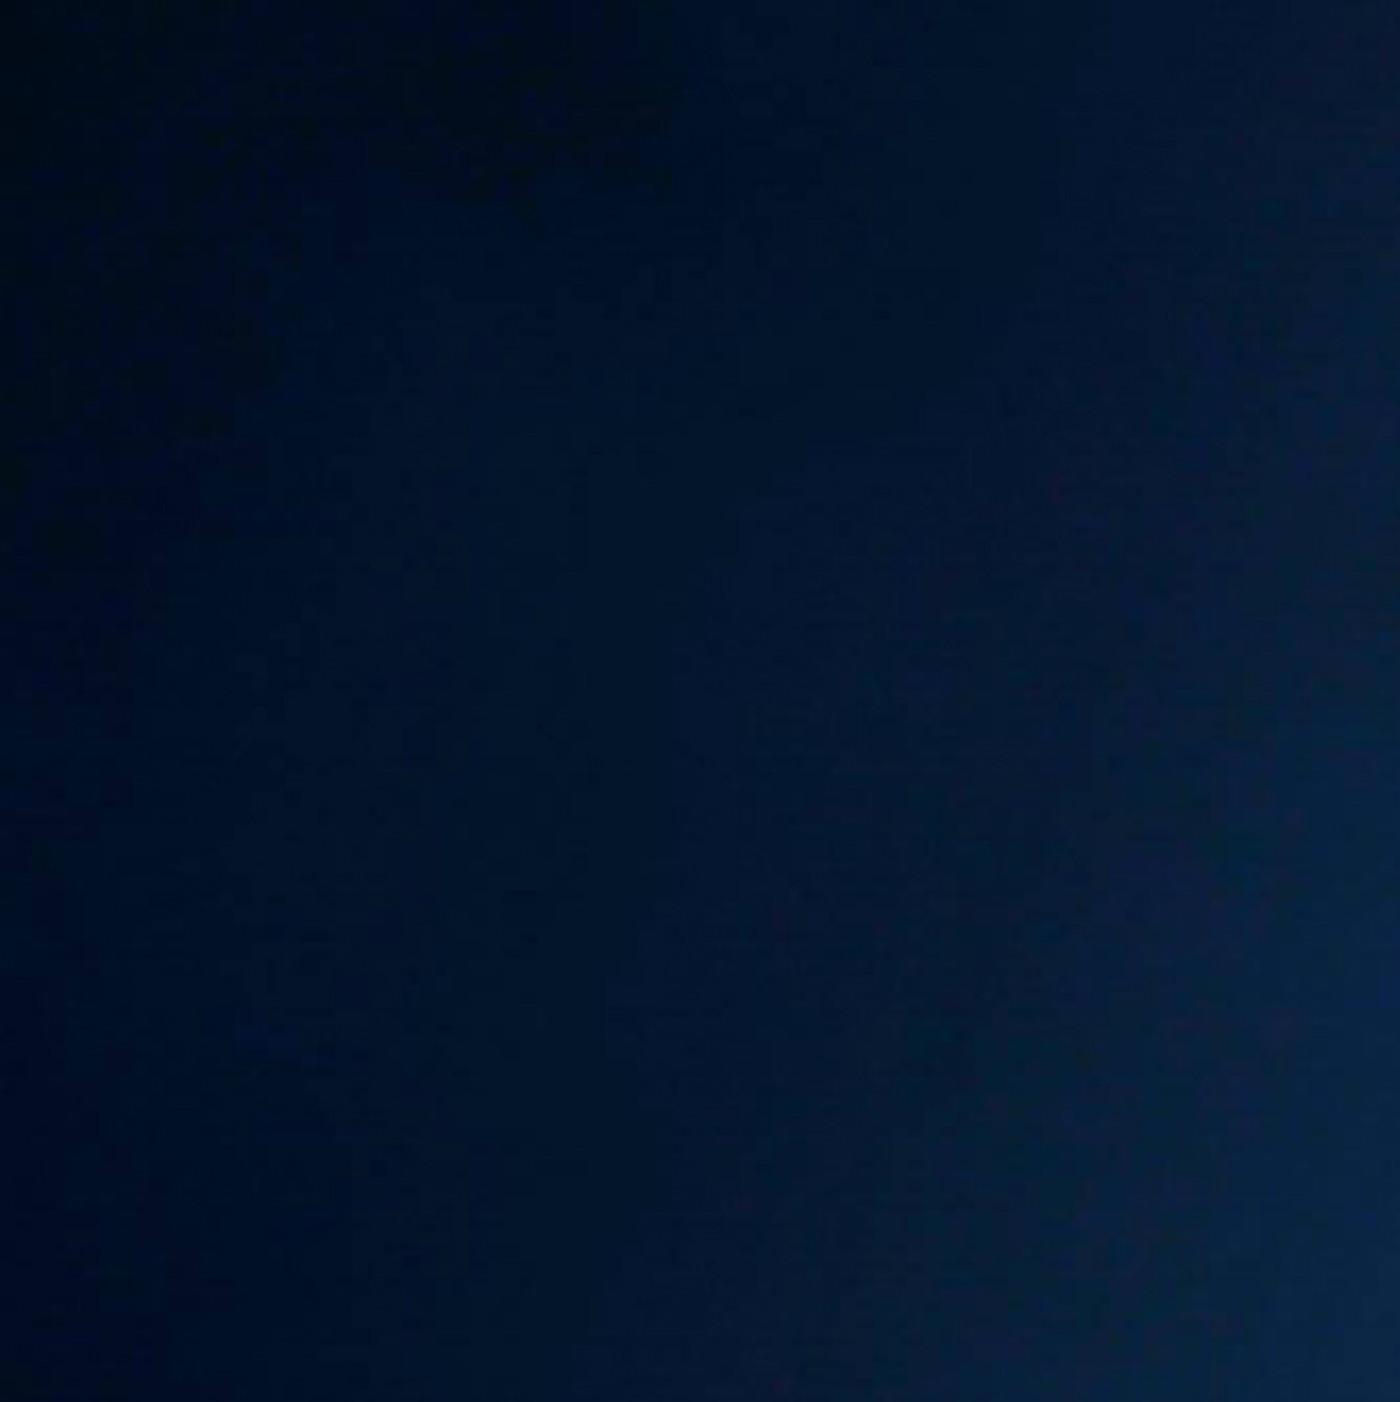 nero-blue-blank